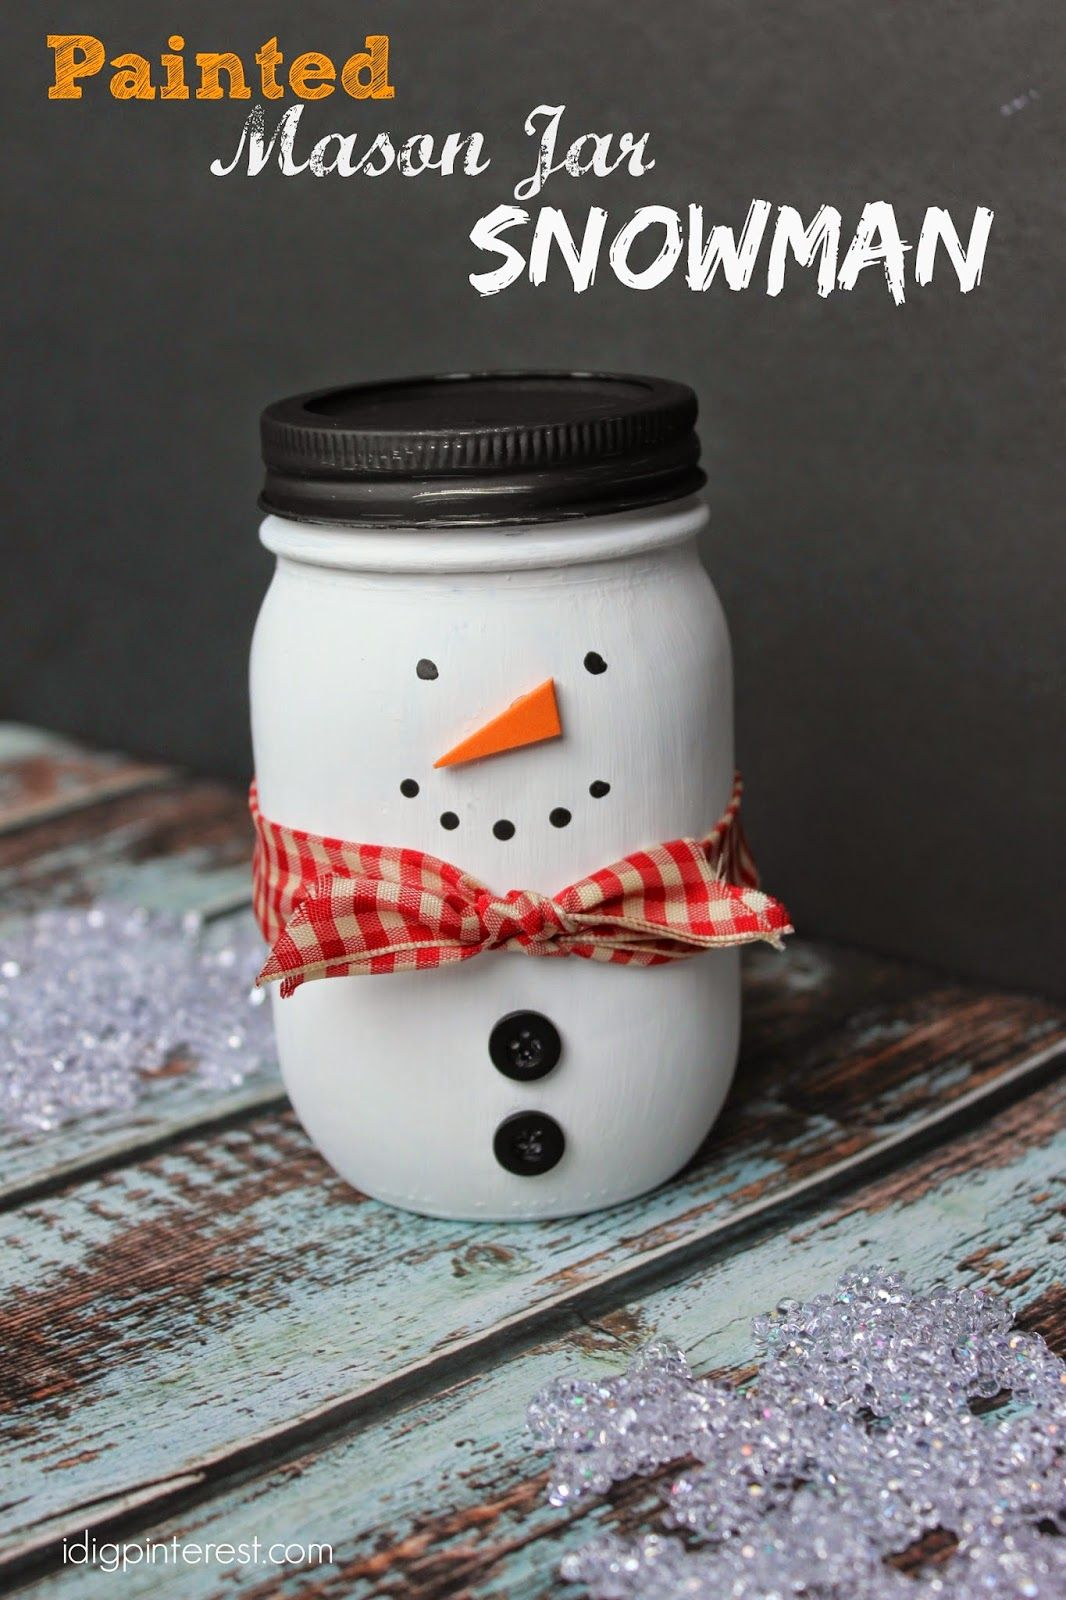 I M Slightly Obsessed With Mason Jars Right Now And Because My Santa Painted Mason J Mason Jar Christmas Crafts Christmas Mason Jars Diy Easy Mason Jar Crafts